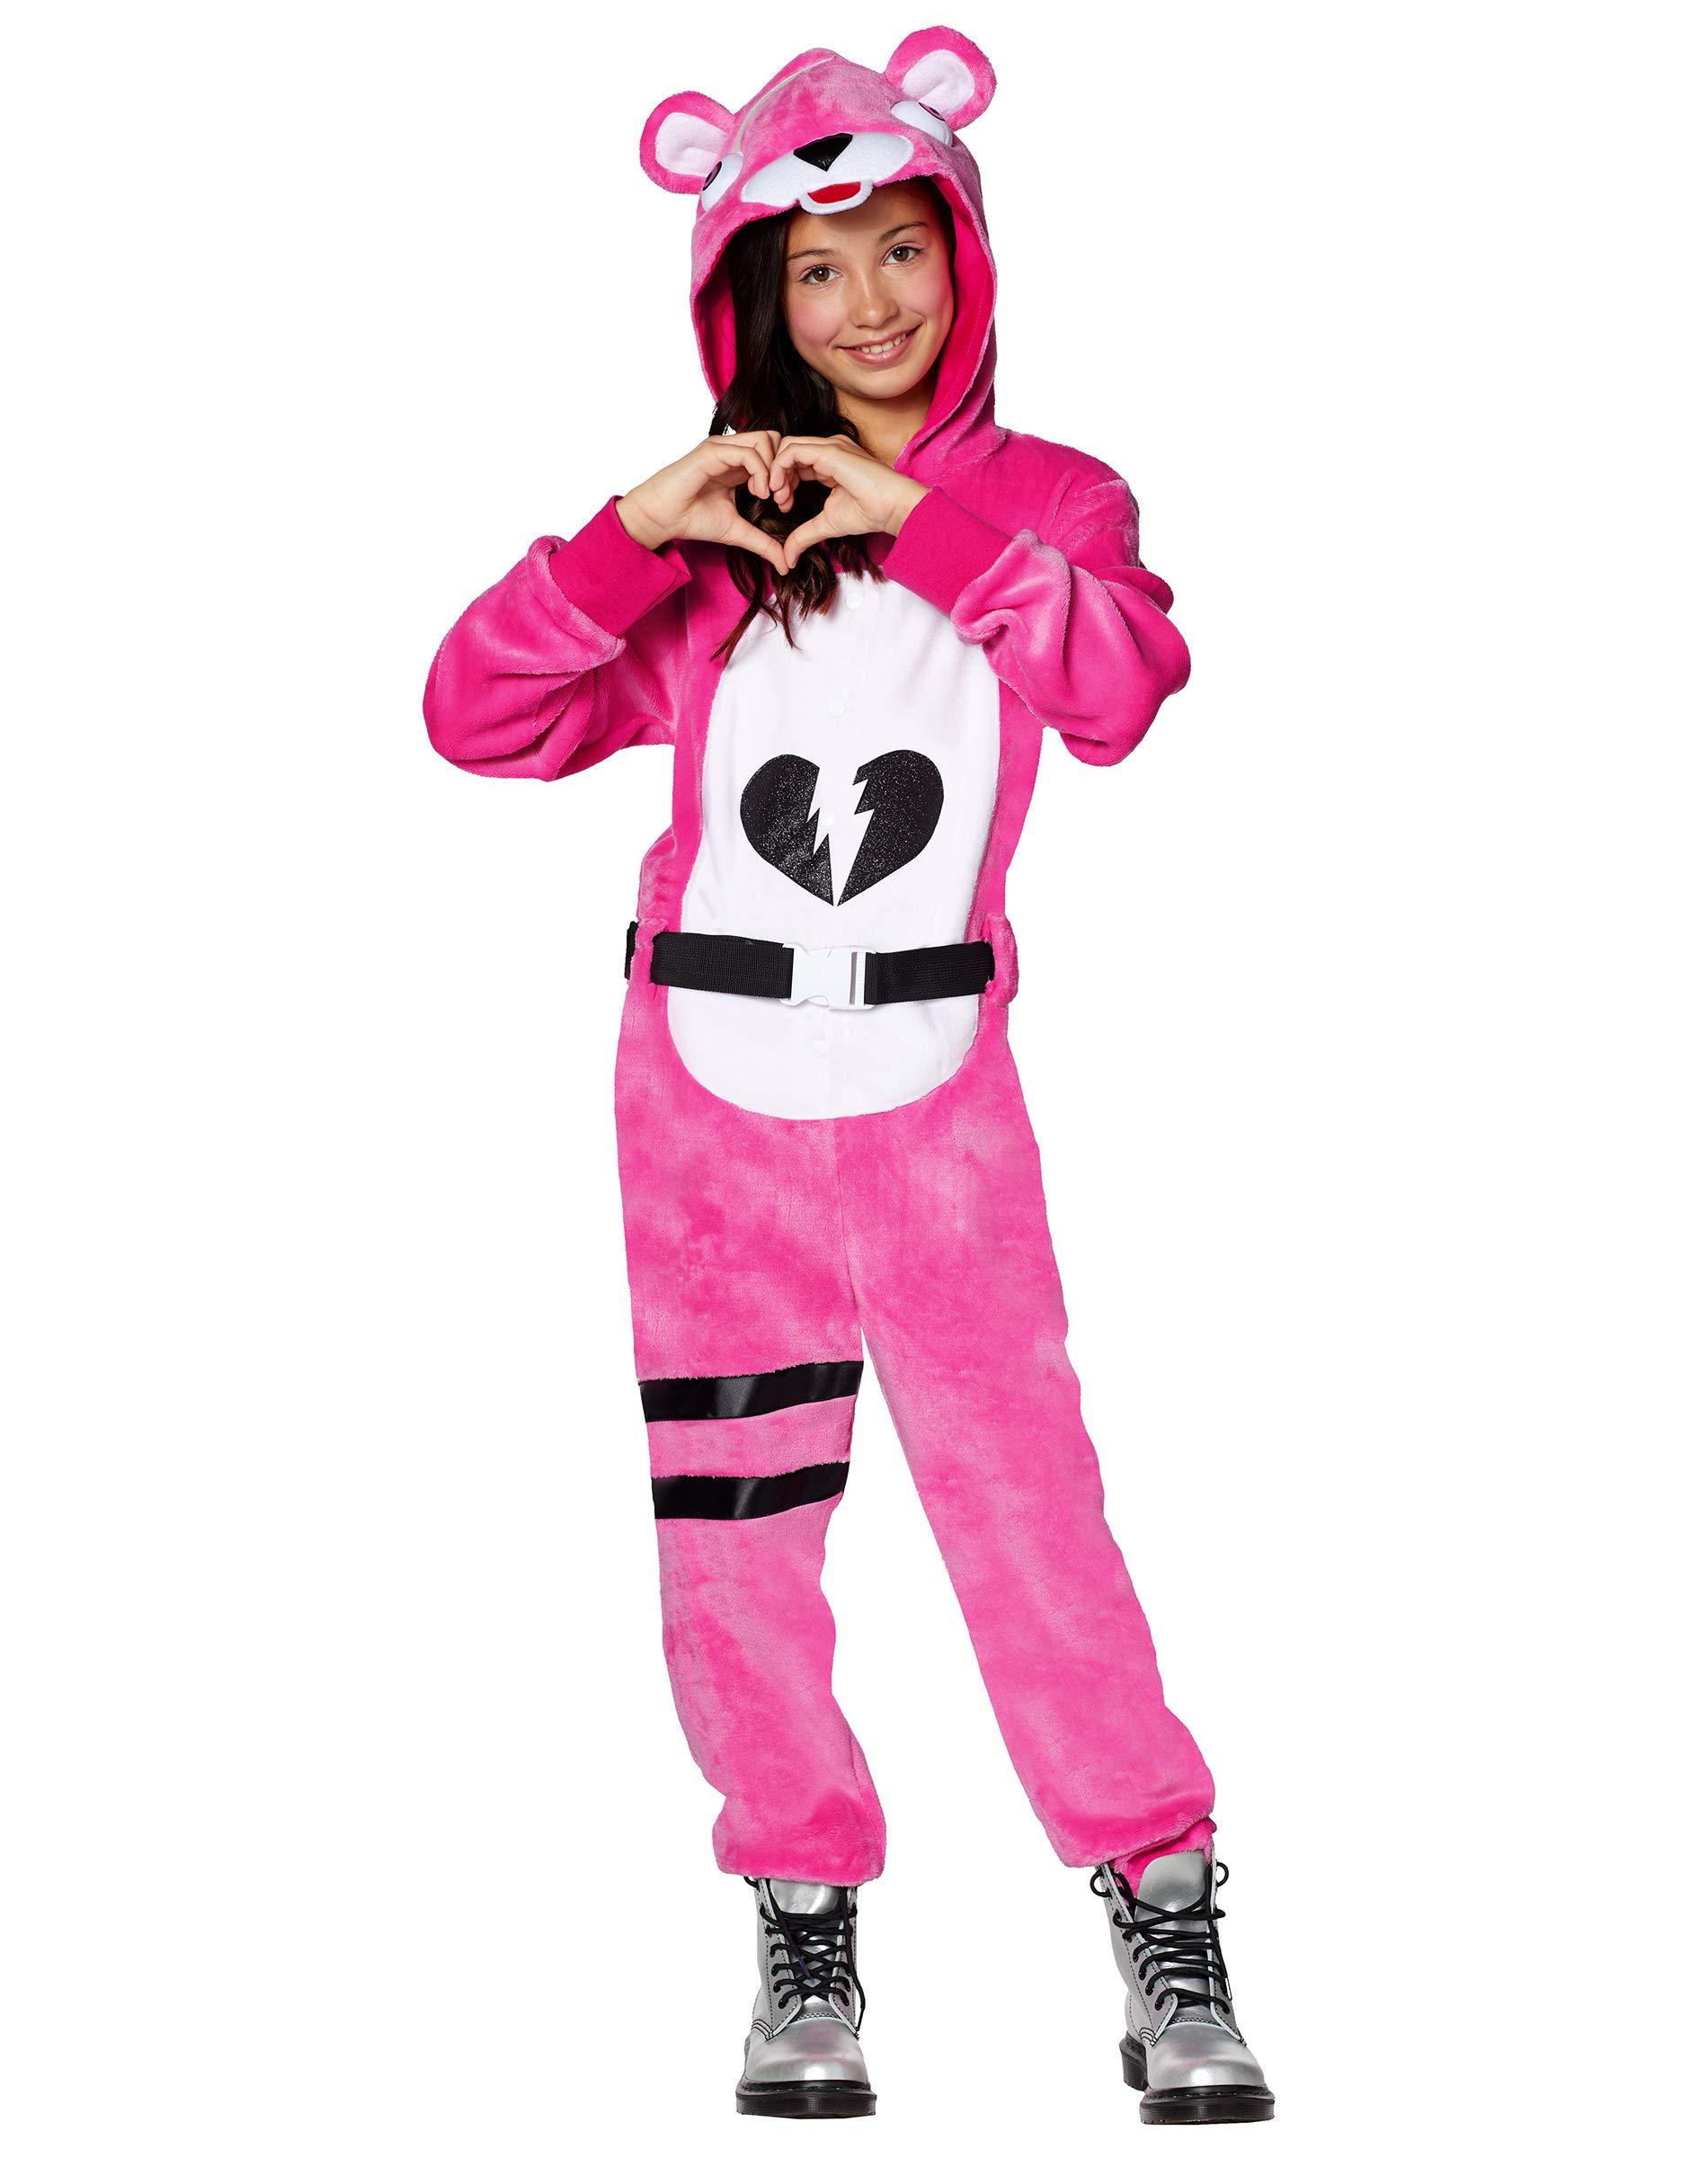 Spirit Halloween Kids Fortnite Plush Cuddle Team Leader Costume by Spirit Halloween (Image #1)